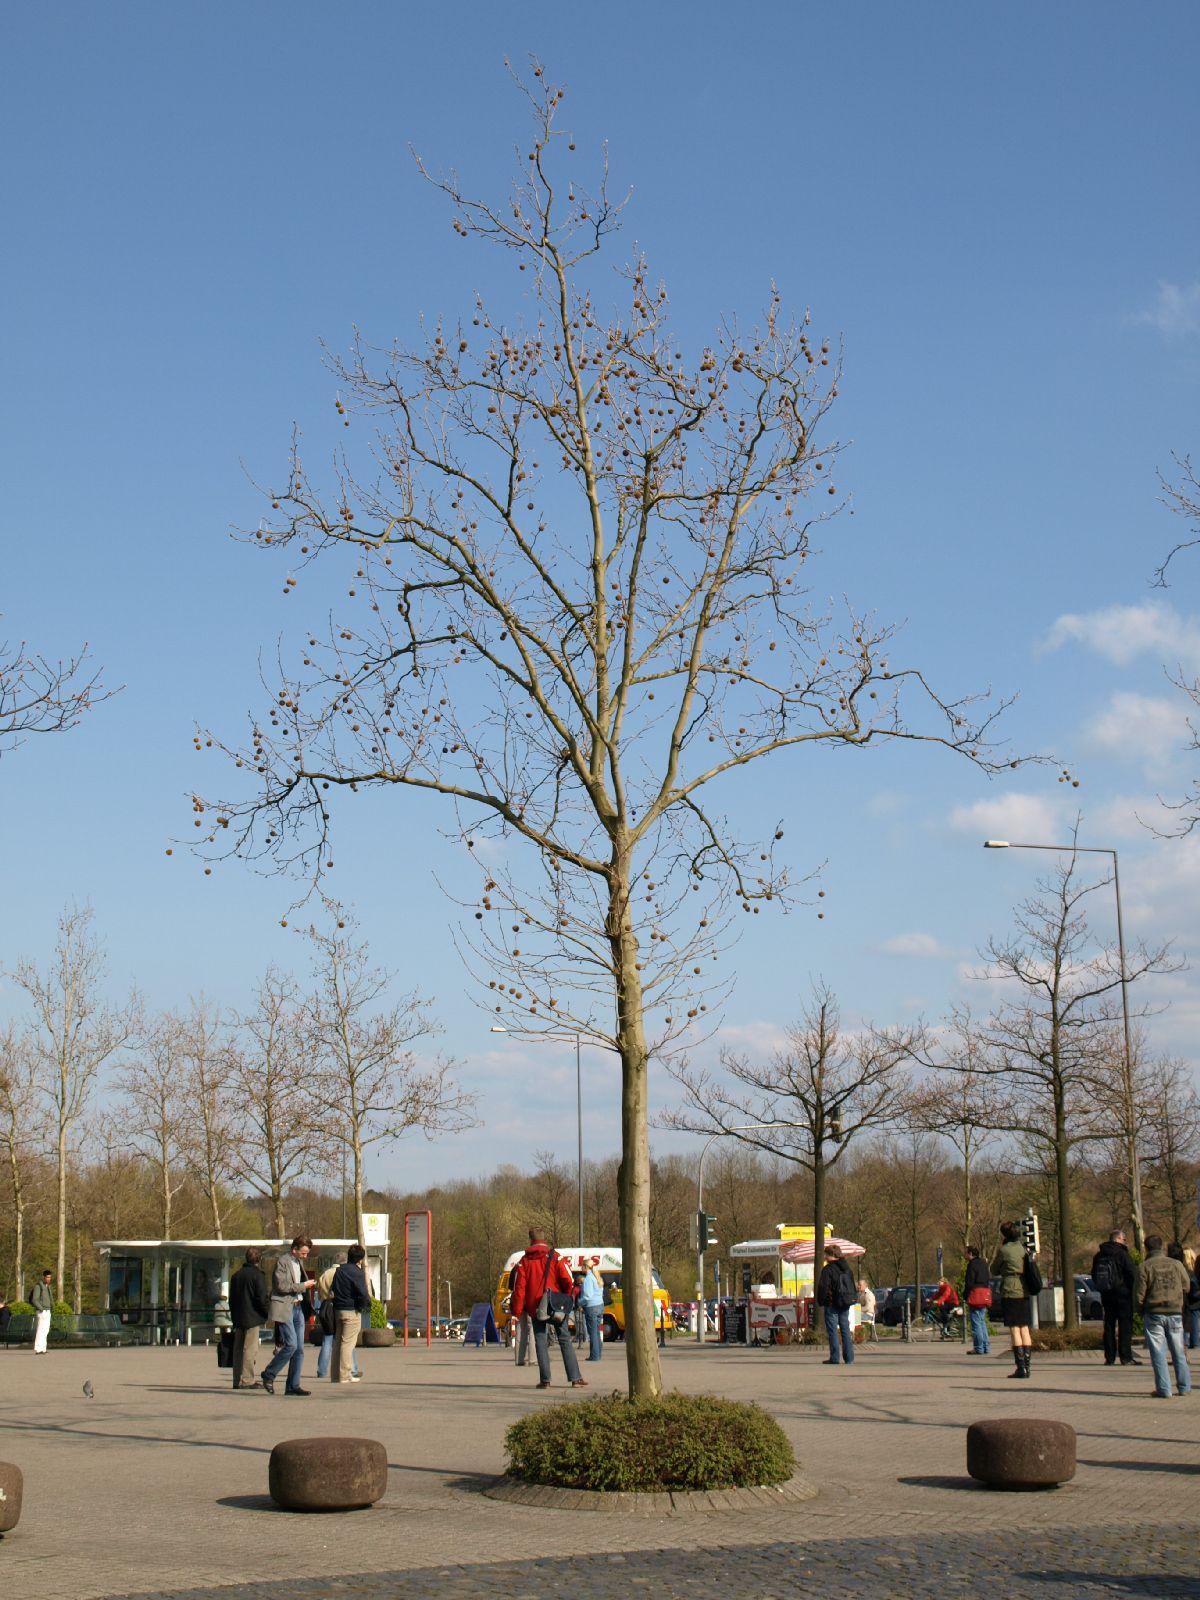 Pflanzen-Baum-Silhouette-Foto_Textur_B_P4171345